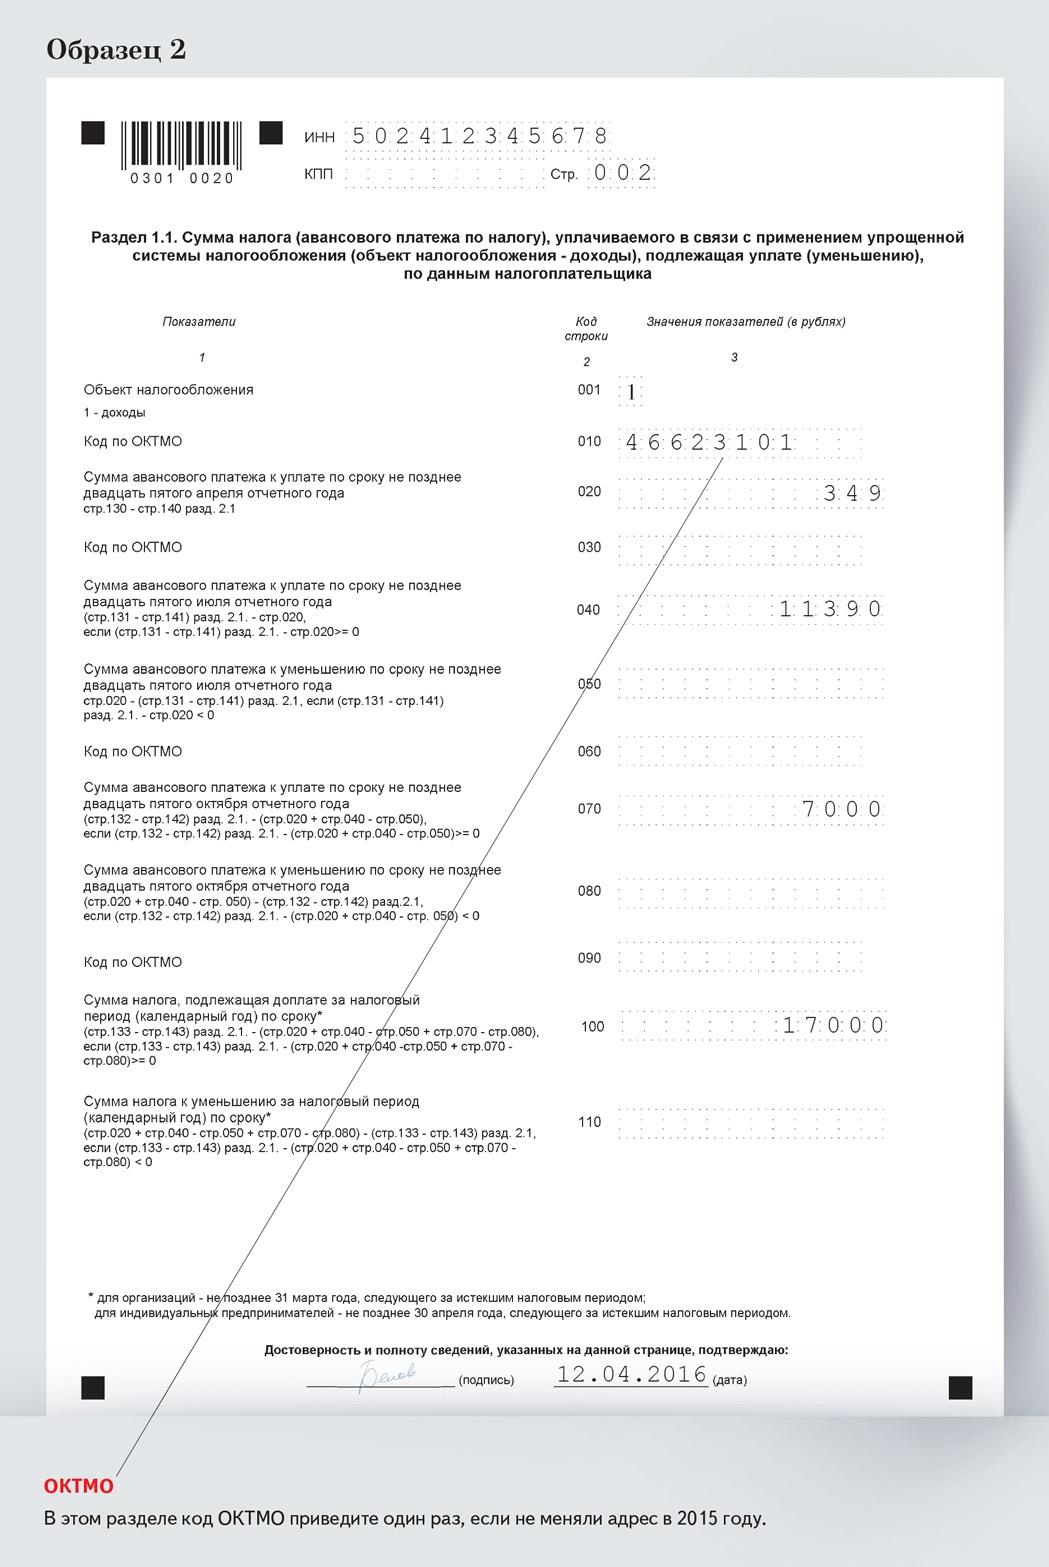 скачат бланк декларации усн за 2011